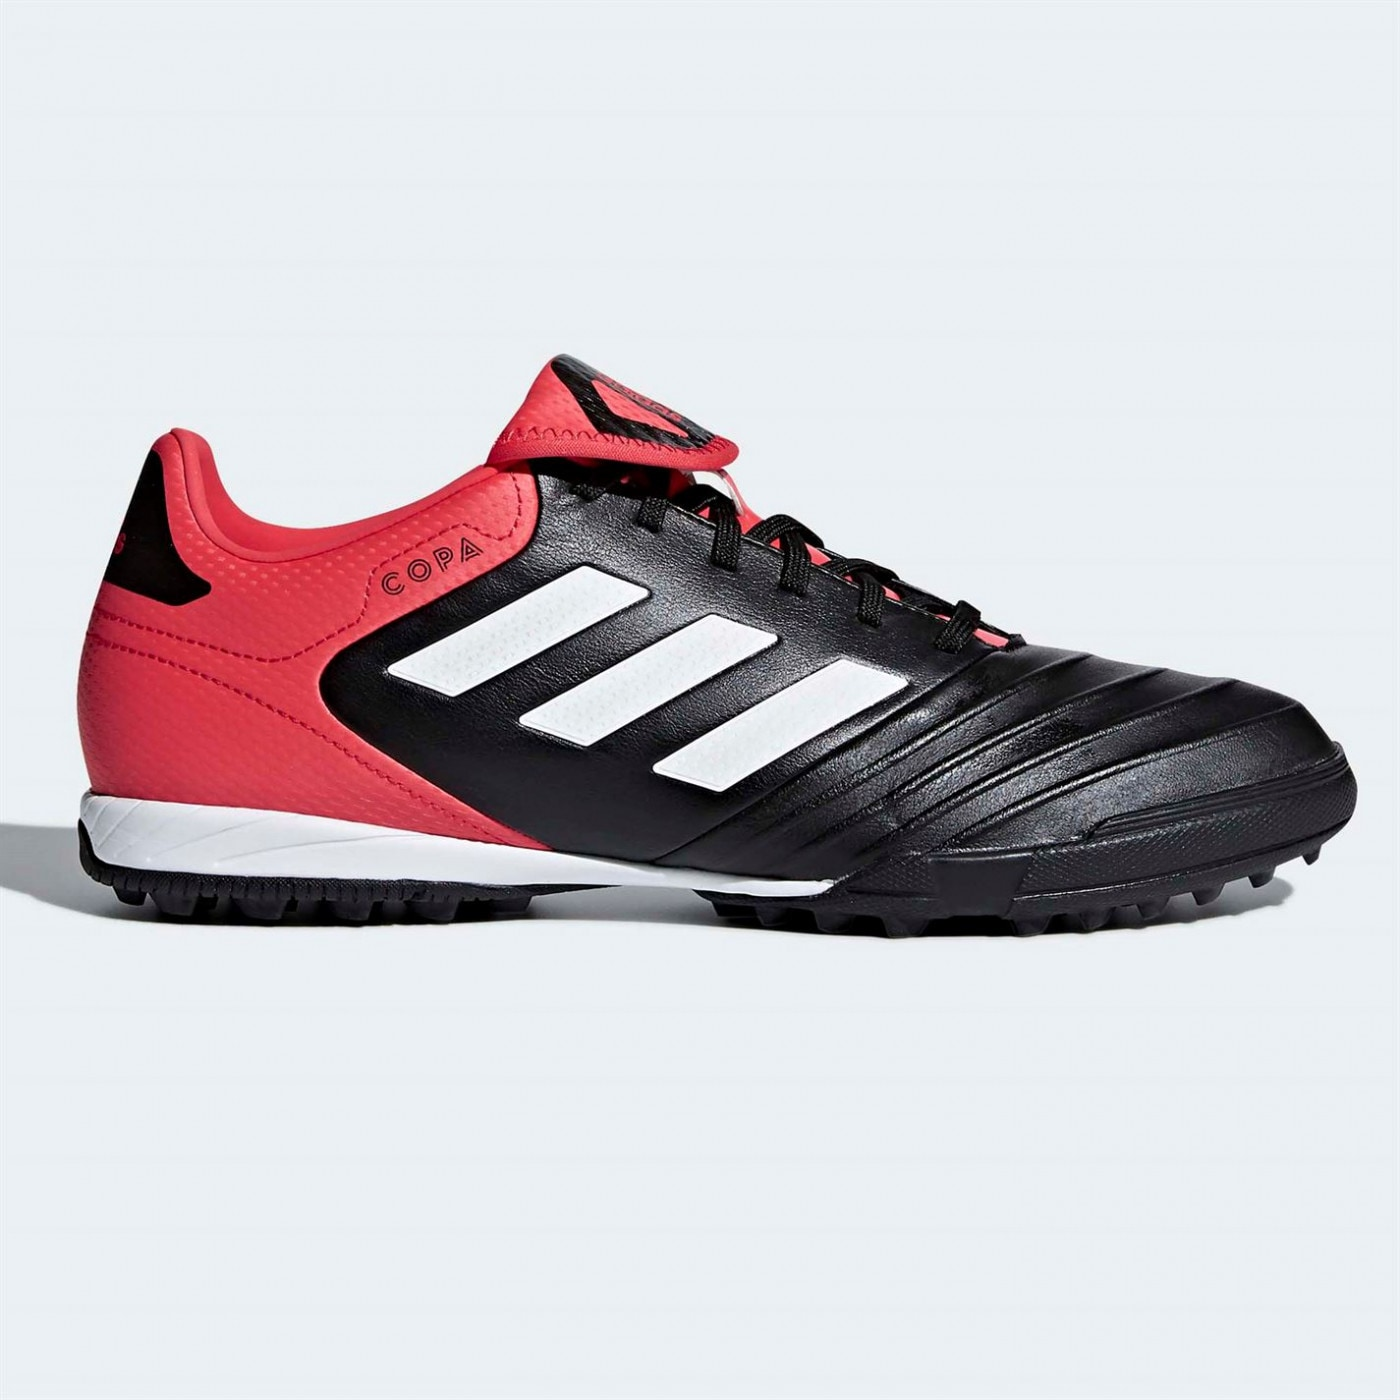 low priced 14881 5adbb adidas Copa Tango 18.3 Mens Astro Turf Trainers